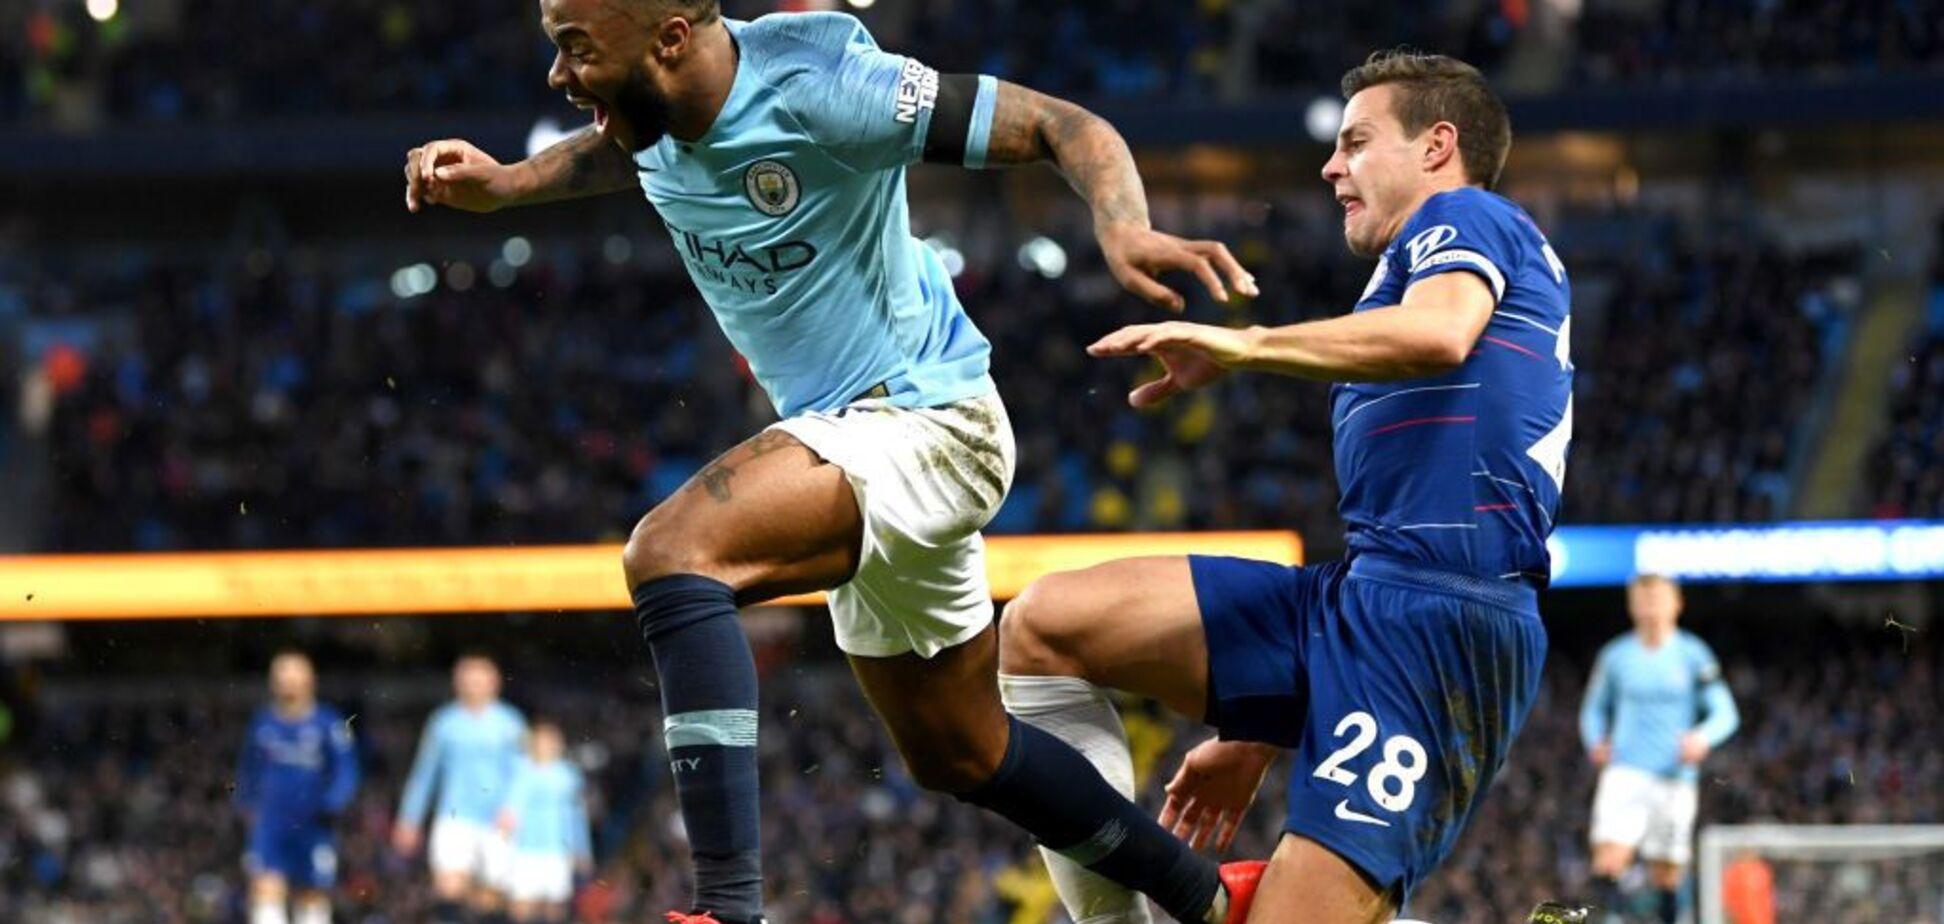 'Манчестер Сити' шокировал 'Челси' в чемпионате Англии - опубликовано видео